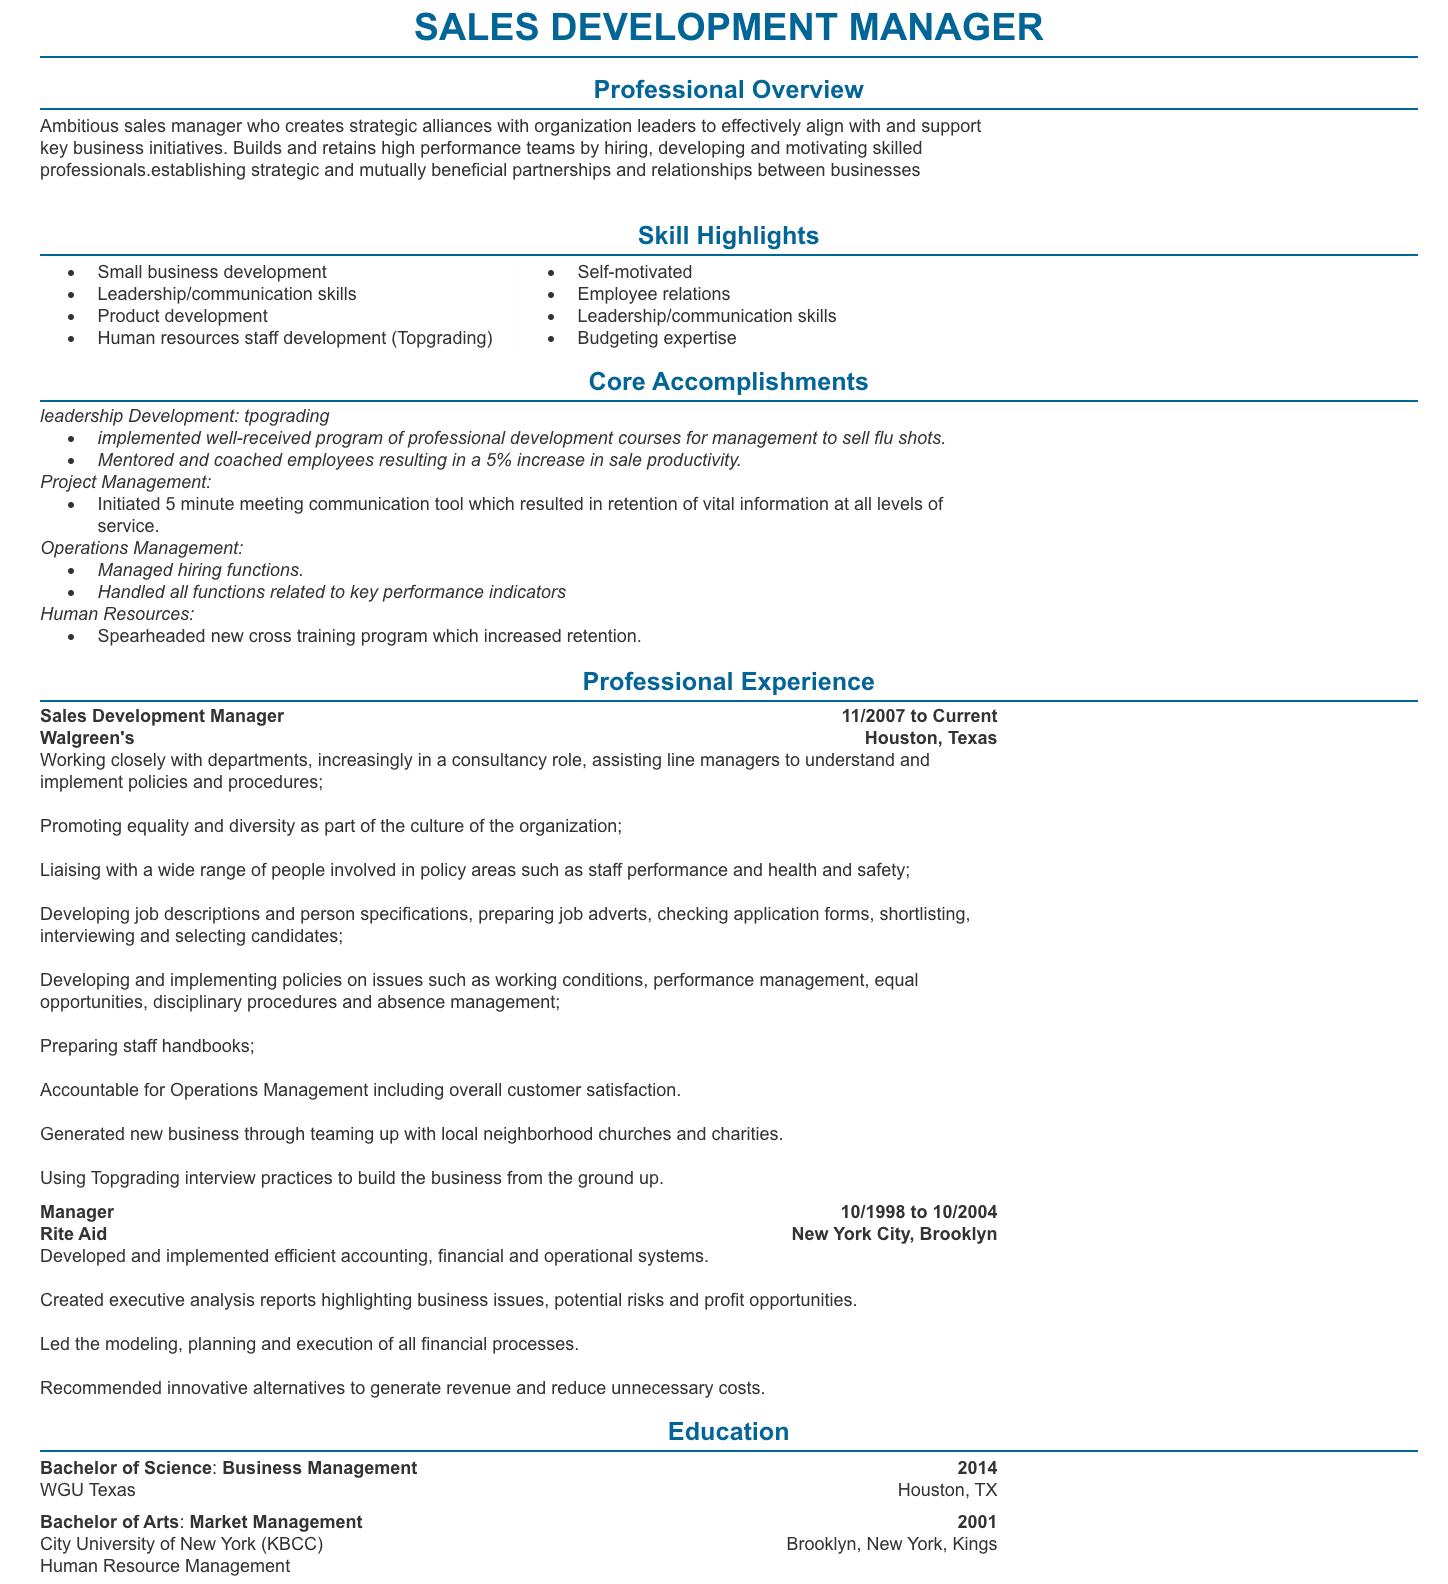 sales development manager resume exmaple